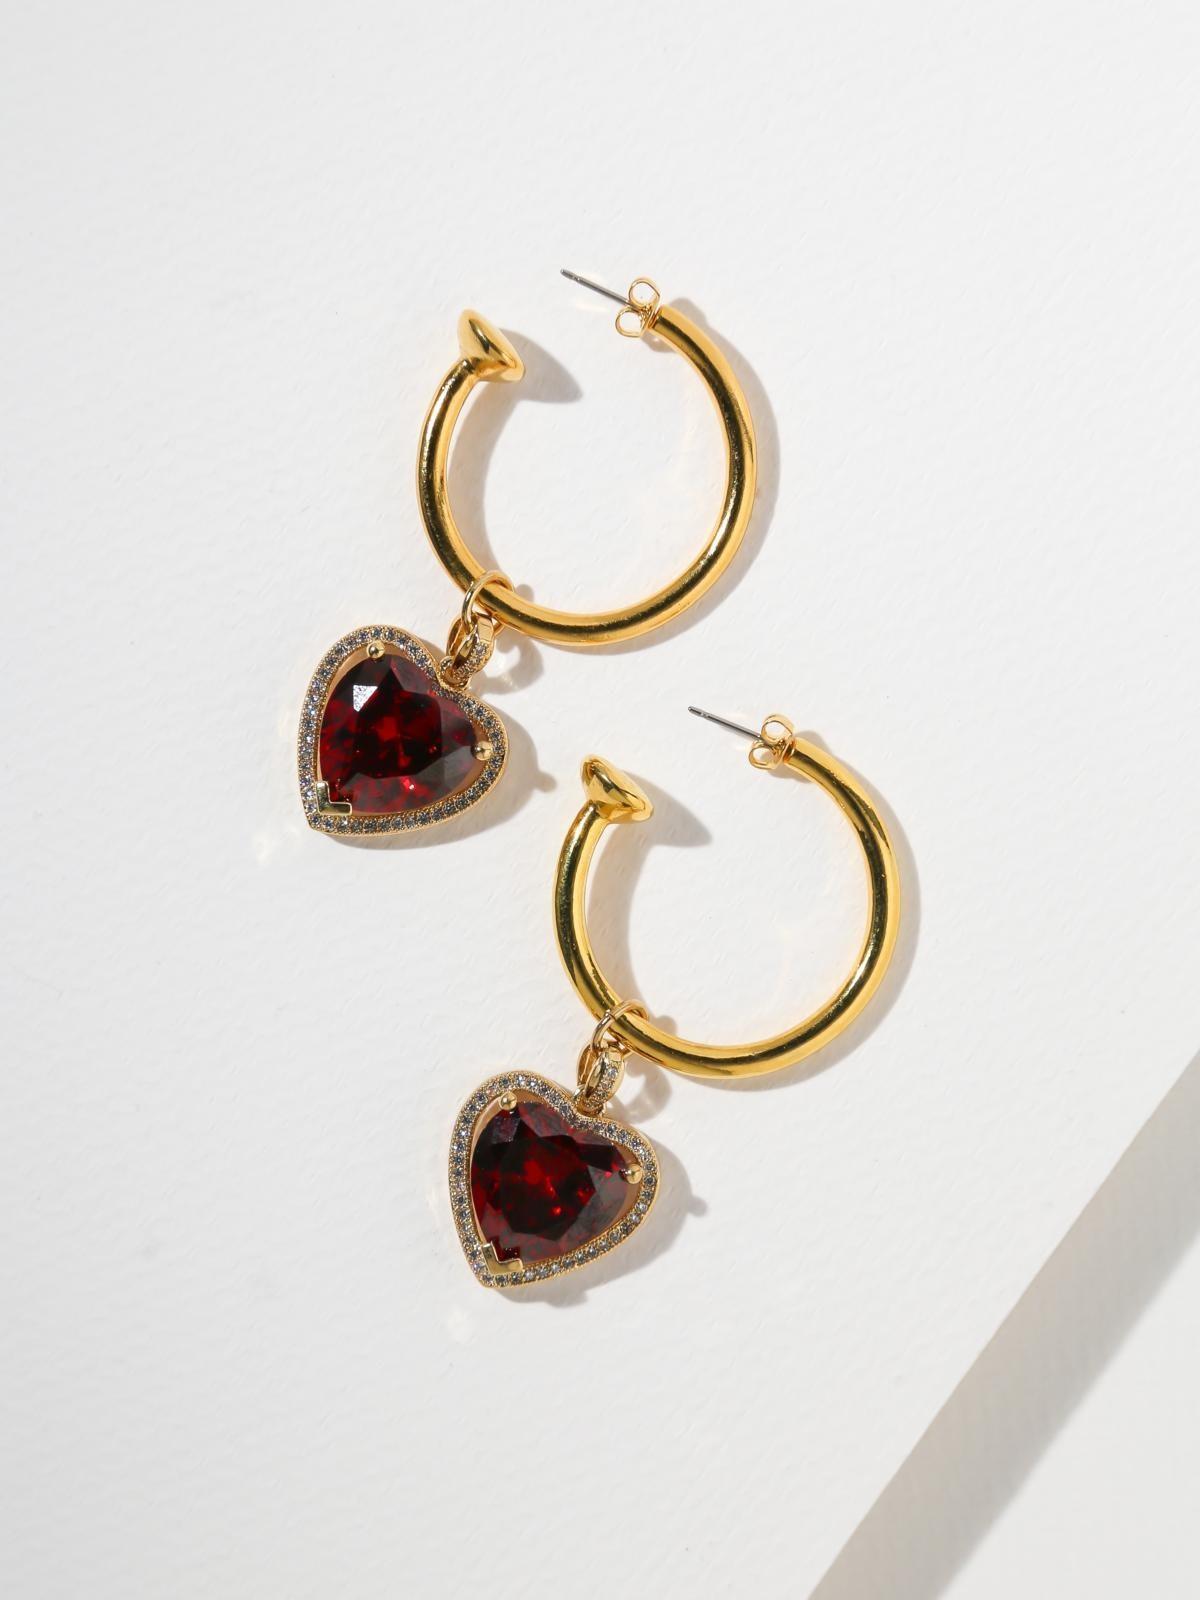 The Ruby Heart Hoop Earrings